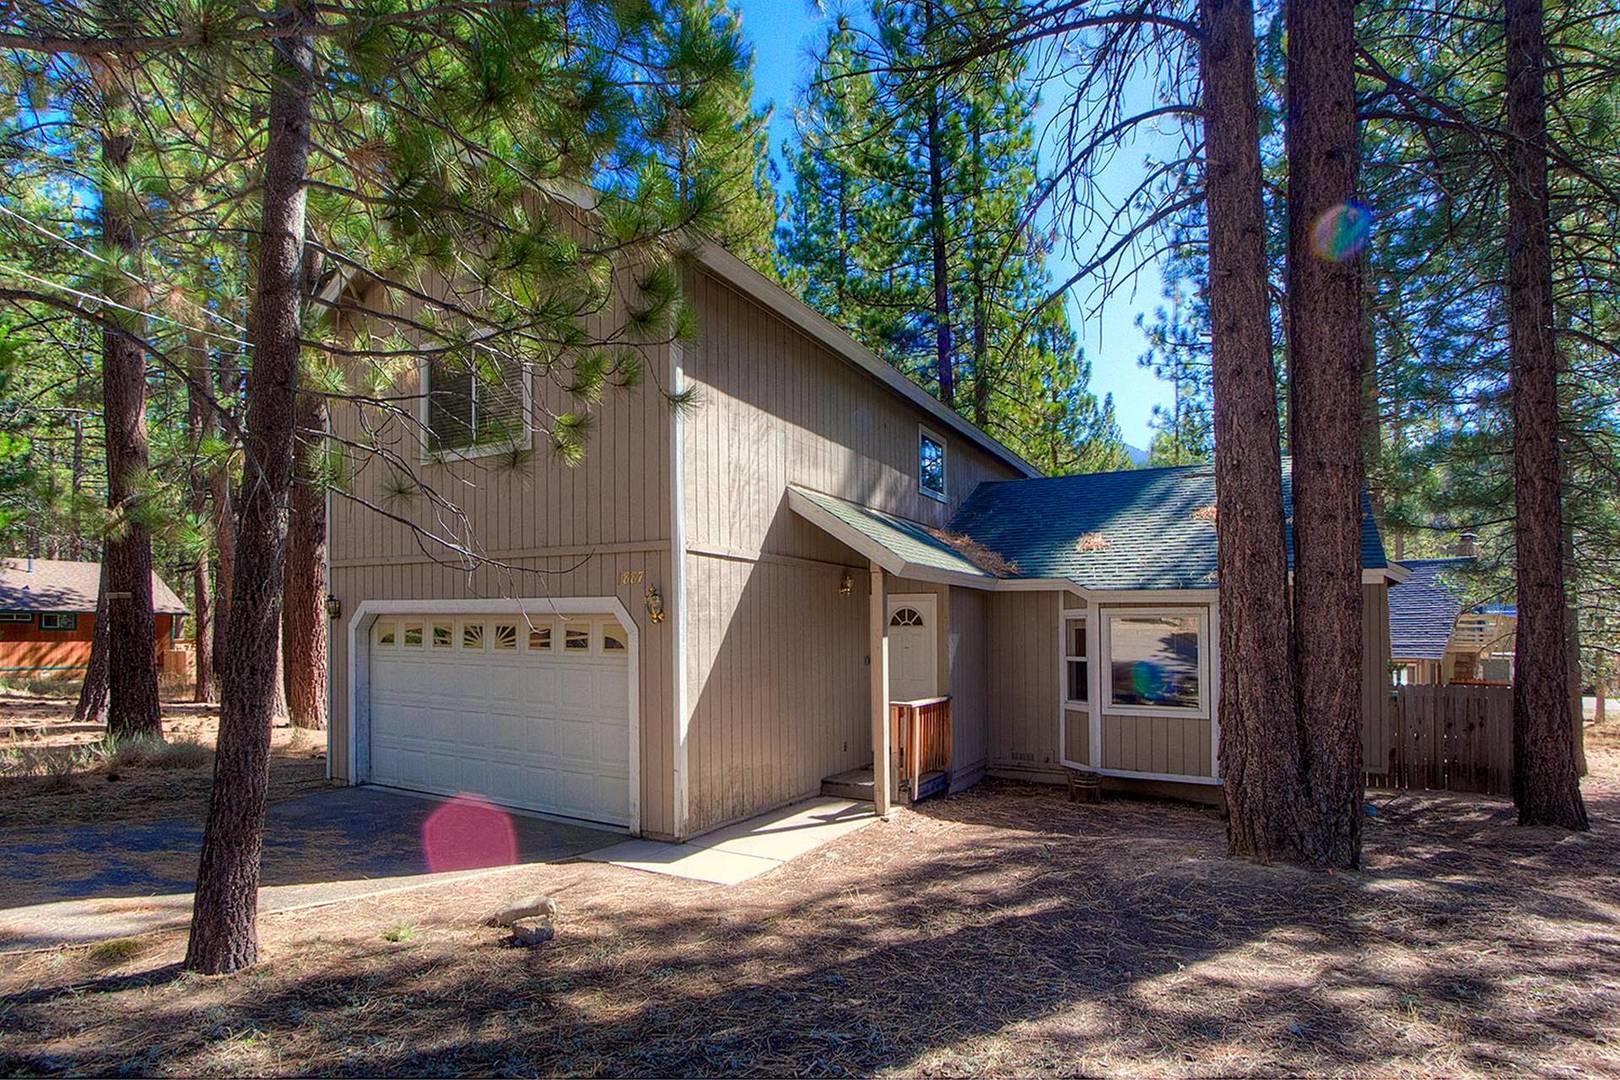 COH0887 Lake Tahoe Vacation Rental